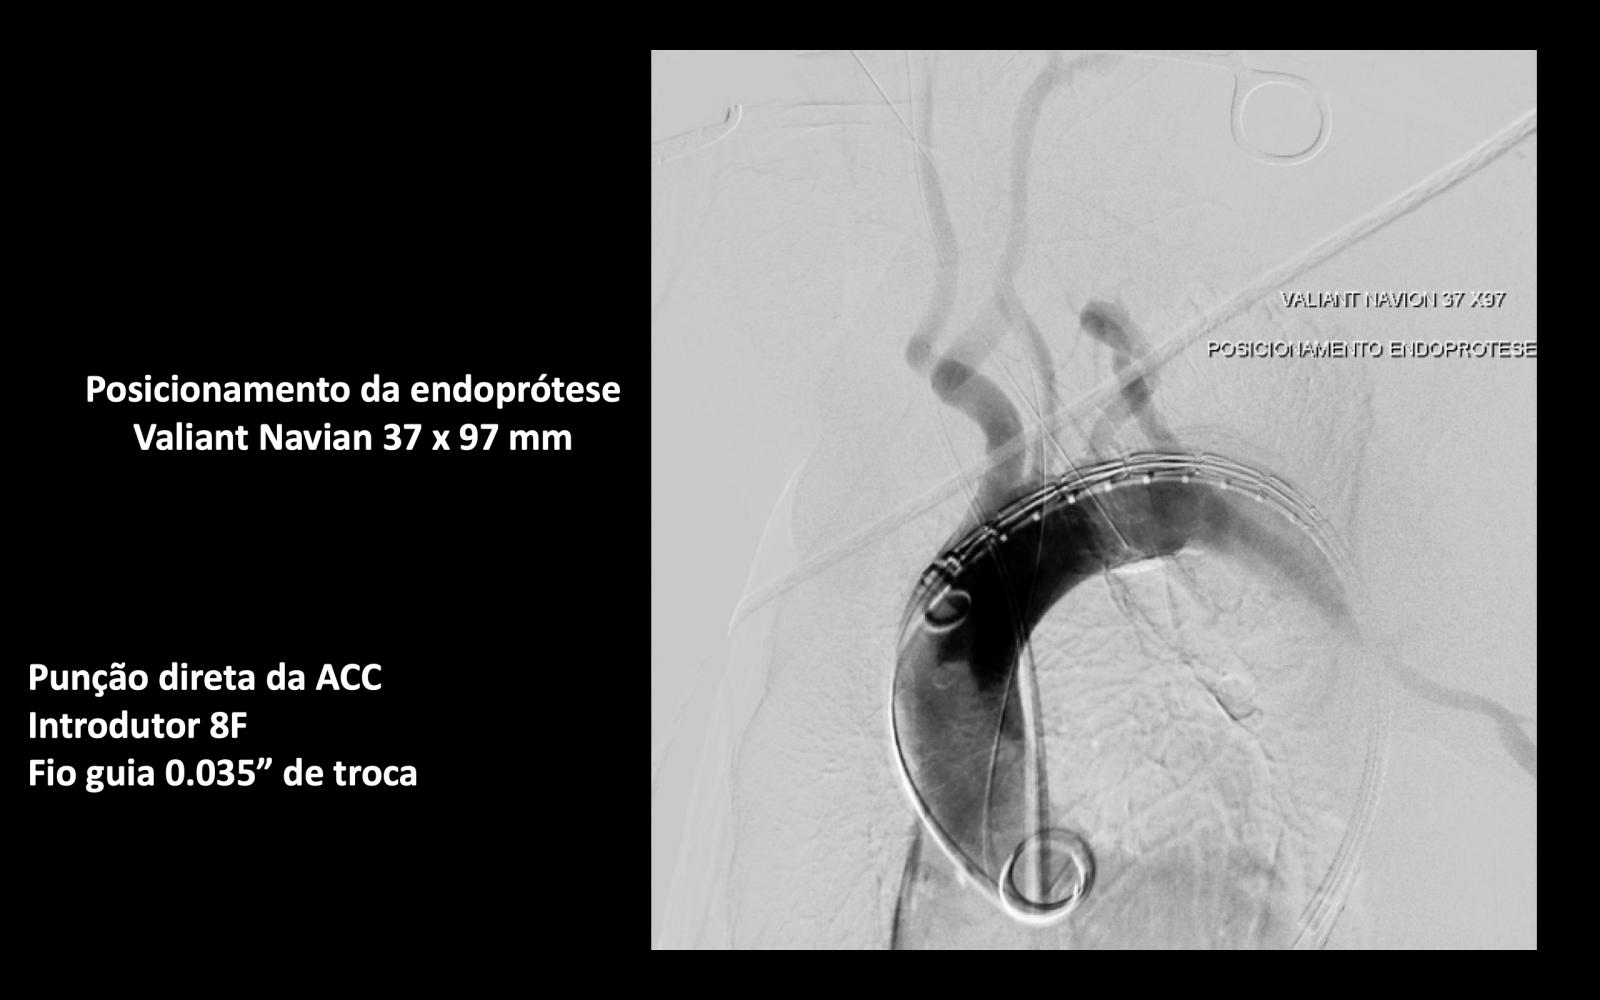 5 - TRATAMENTO ENDOVASCULAR DE ÚLCERA SINTOMÁTICA DA AORTA TORÁCICA (TVAR)